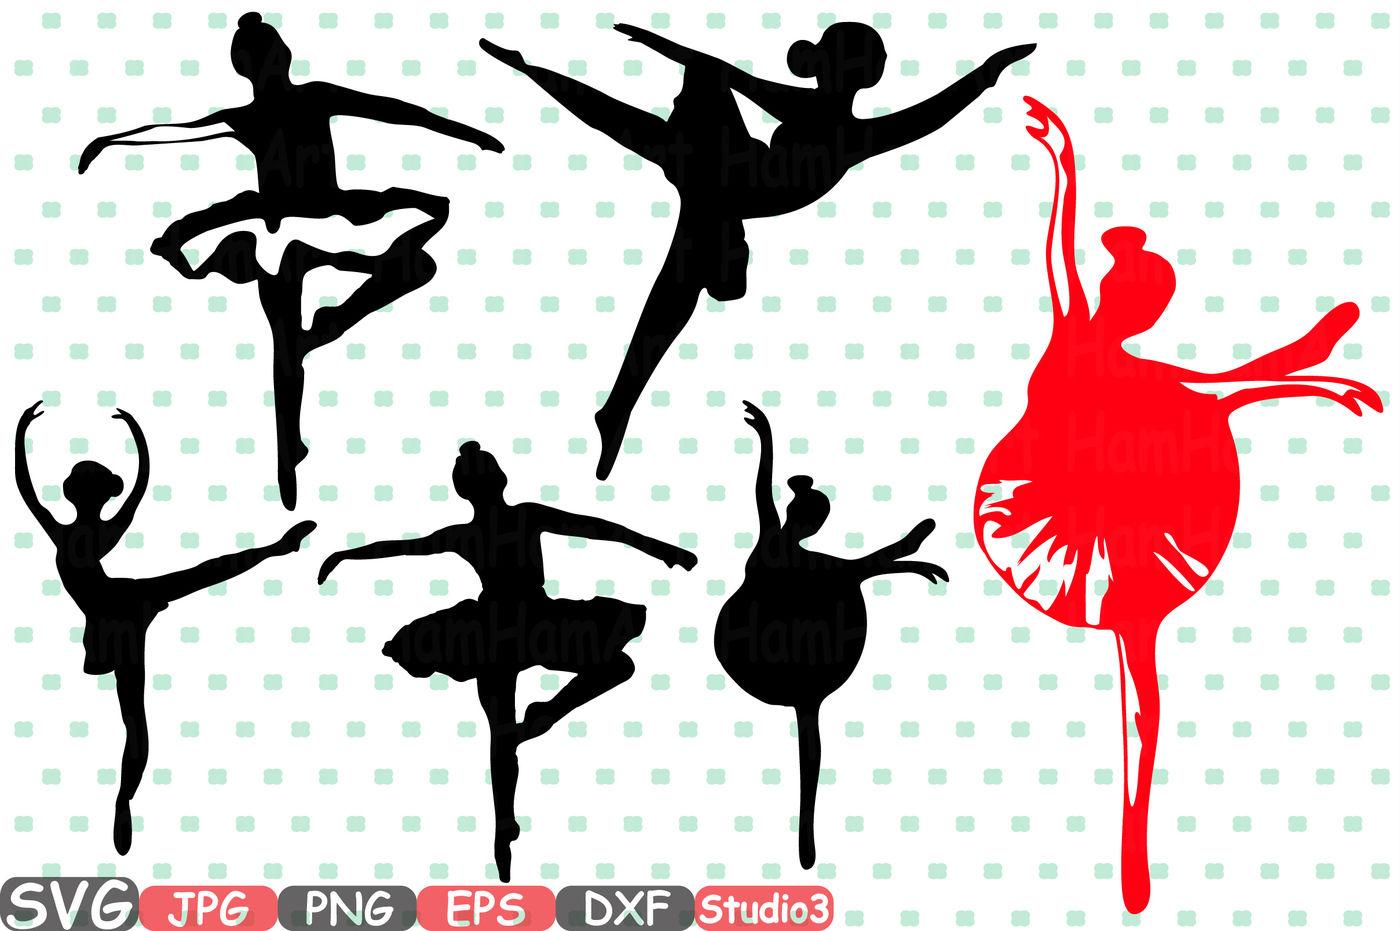 photo relating to Printable Ballerina Silhouette called Ballet Ballerina Silhouette SVG Slicing Information Electronic Clip